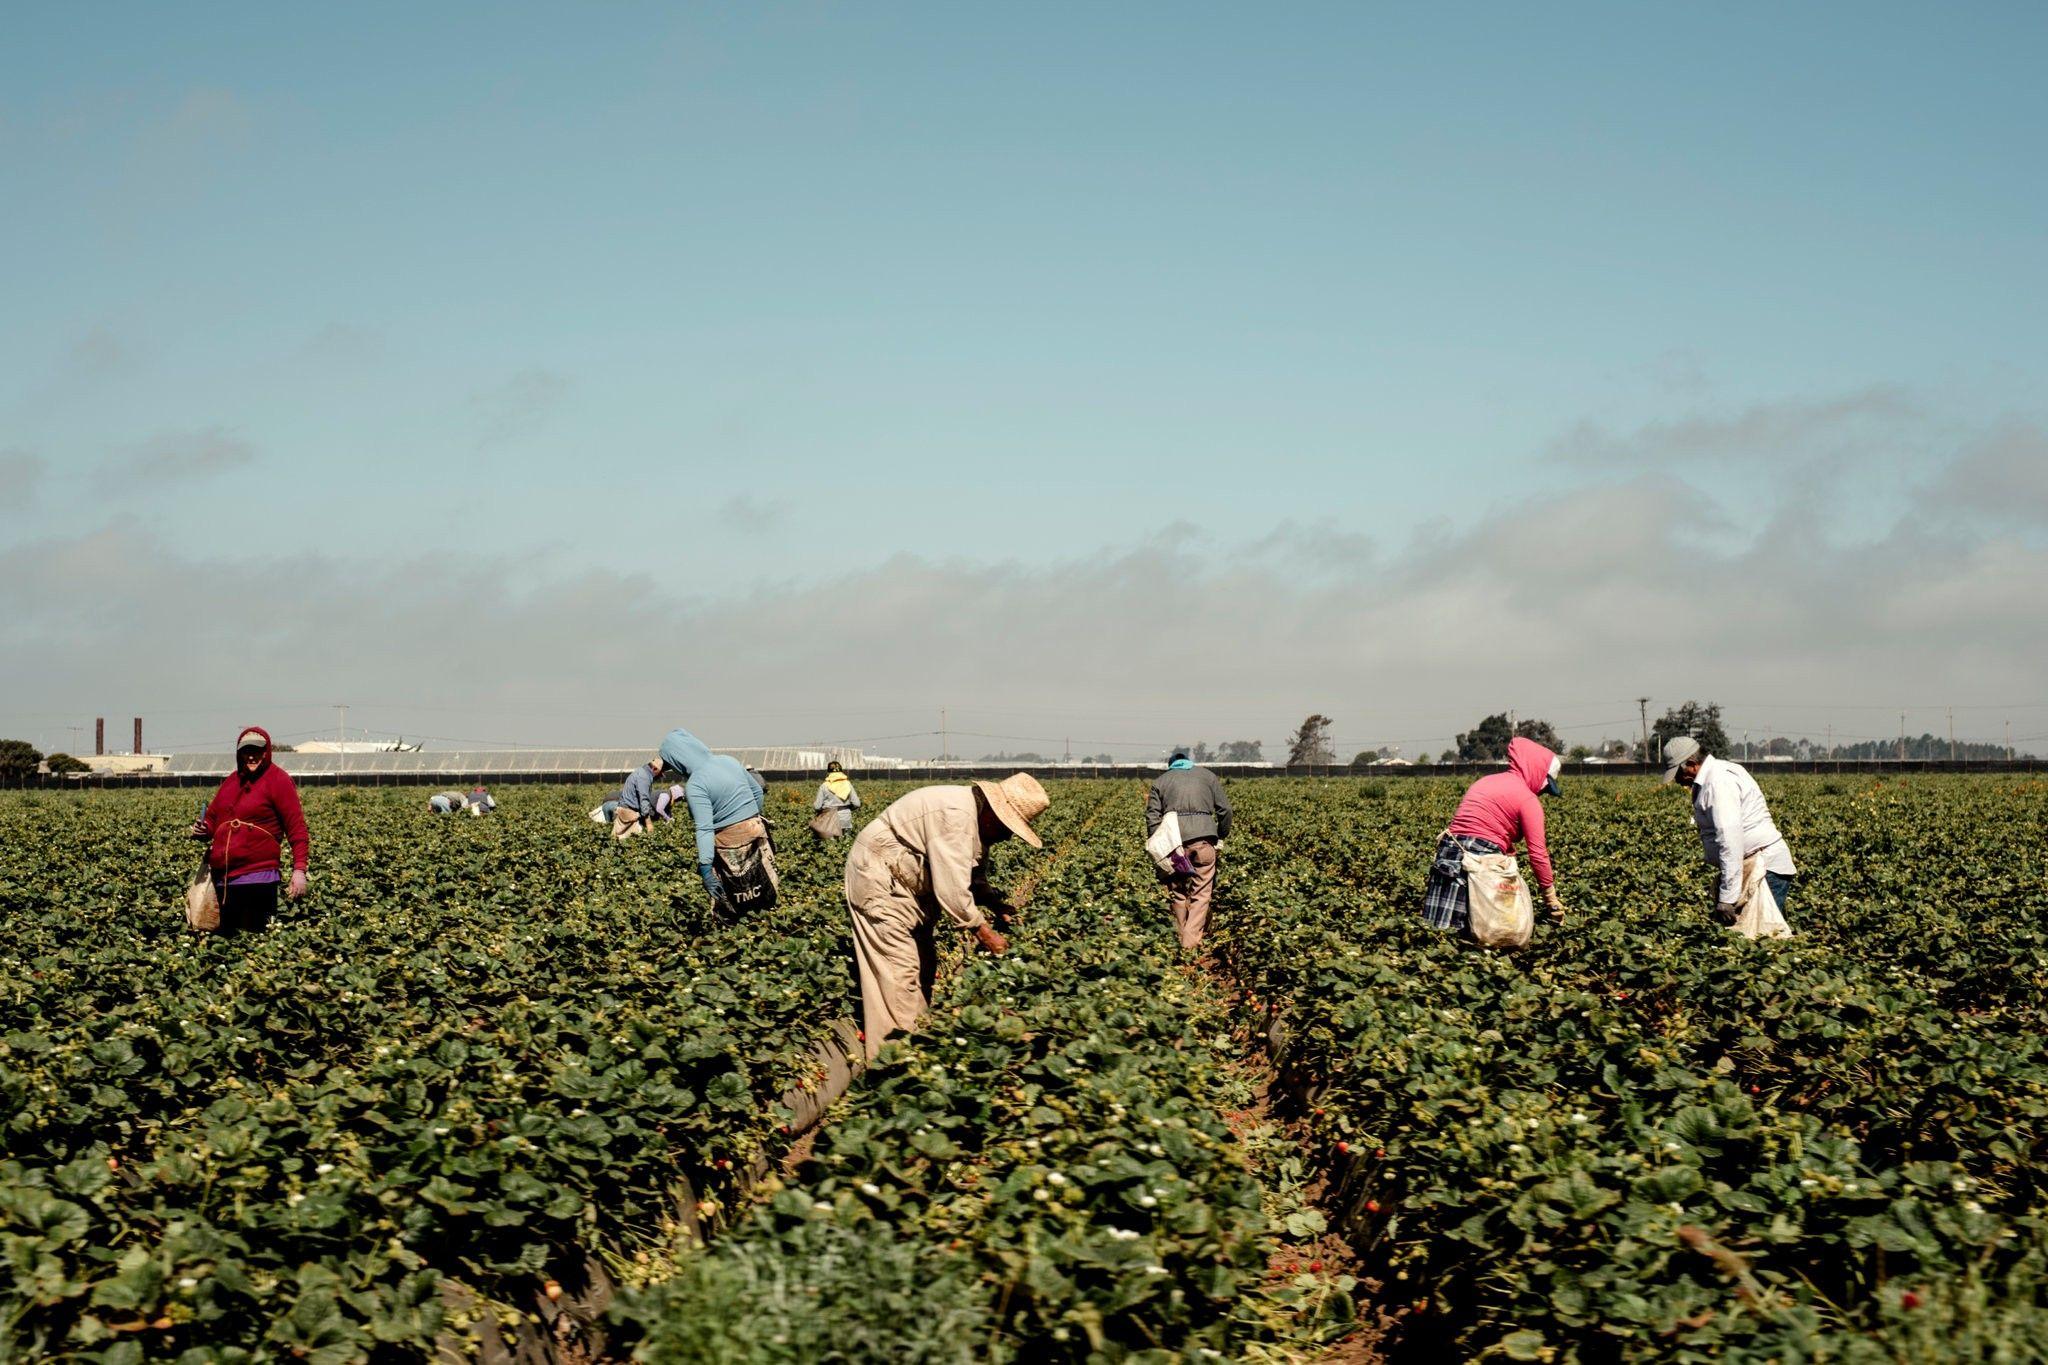 Pesticide studies won epas trust until trumps team